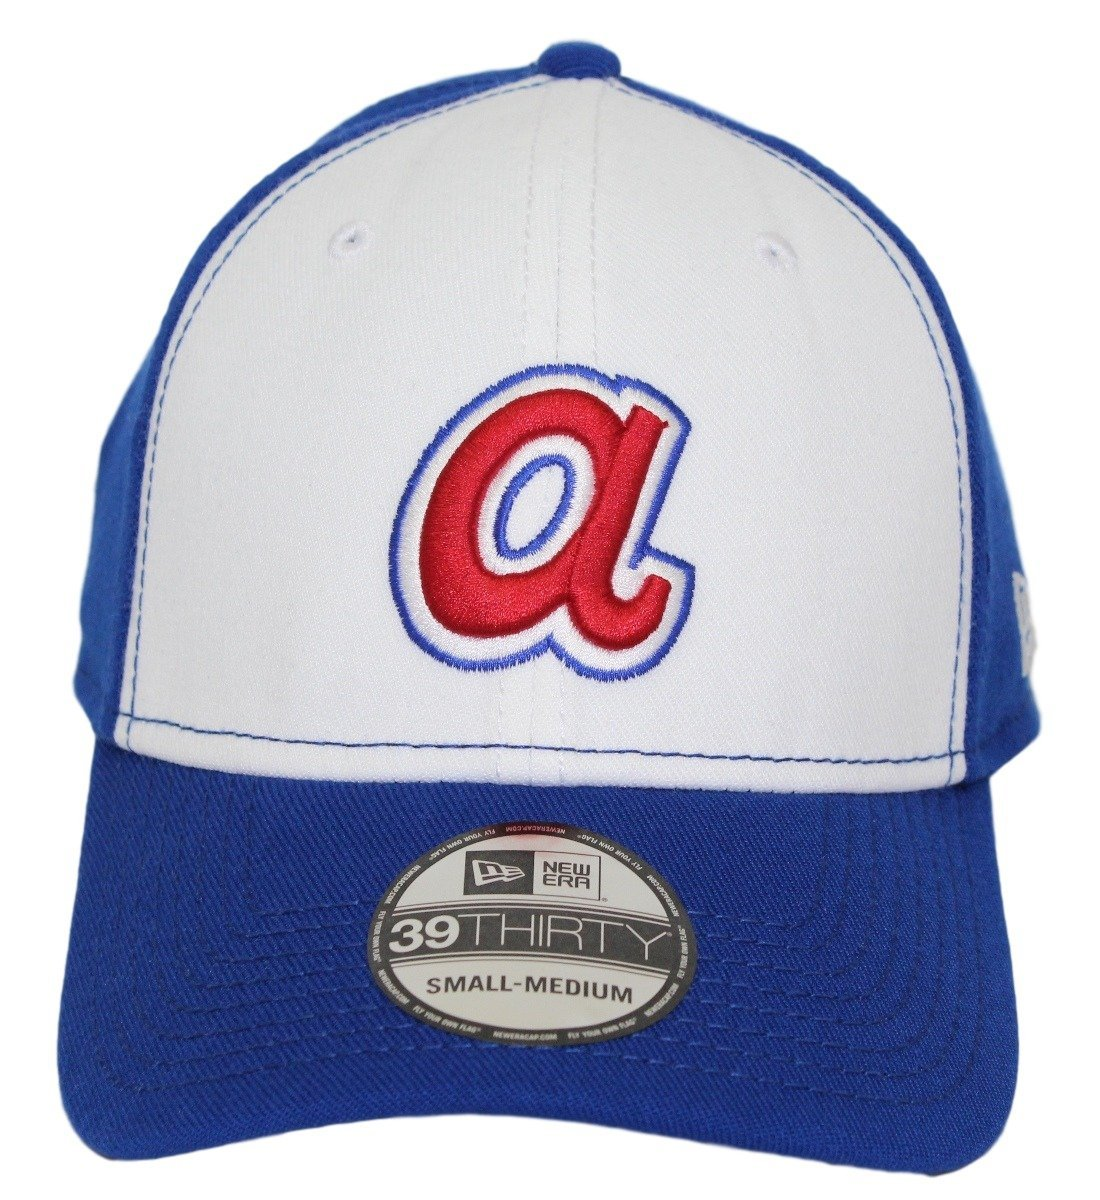 38b12ecbcf5 Hurley Bolts Snapback Flex Fit Men s Baseball Cap Hat. Get Quotations ·  Atlanta Braves New Era MLB 39THIRTY Cooperstown